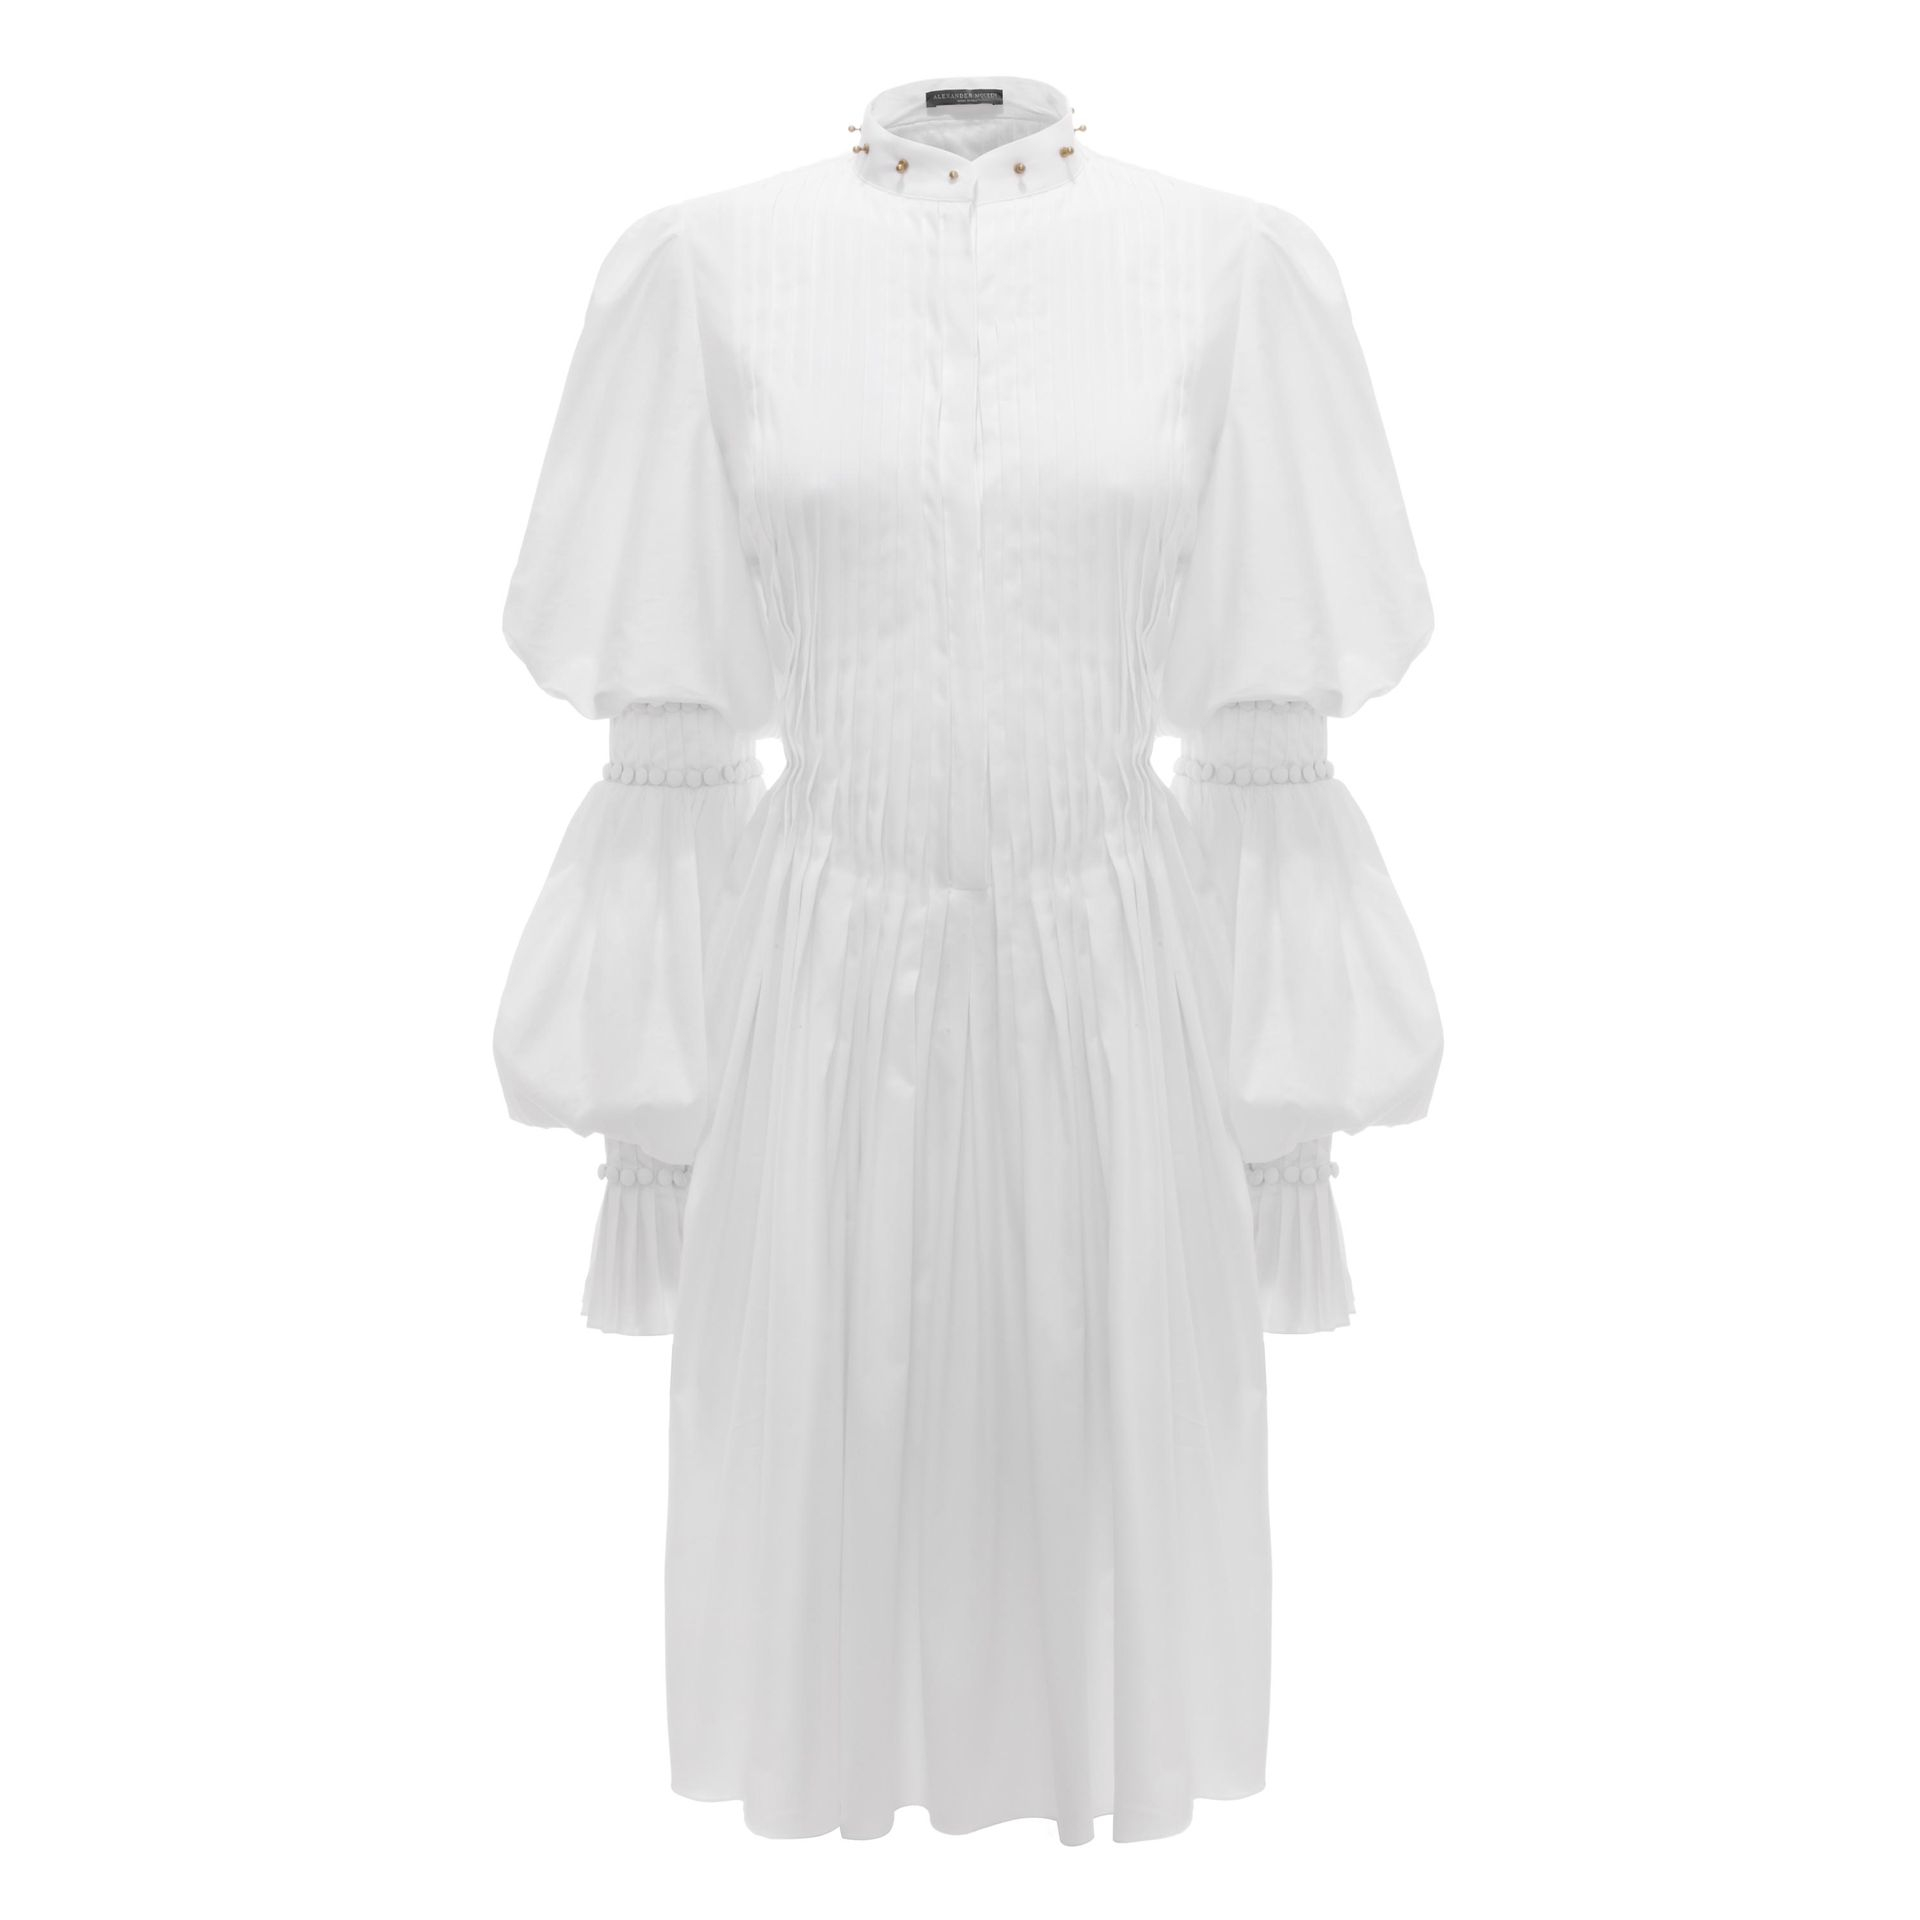 Alexander mcqueen pleated stud collar shirt dress in white for Dress shirt studs uk